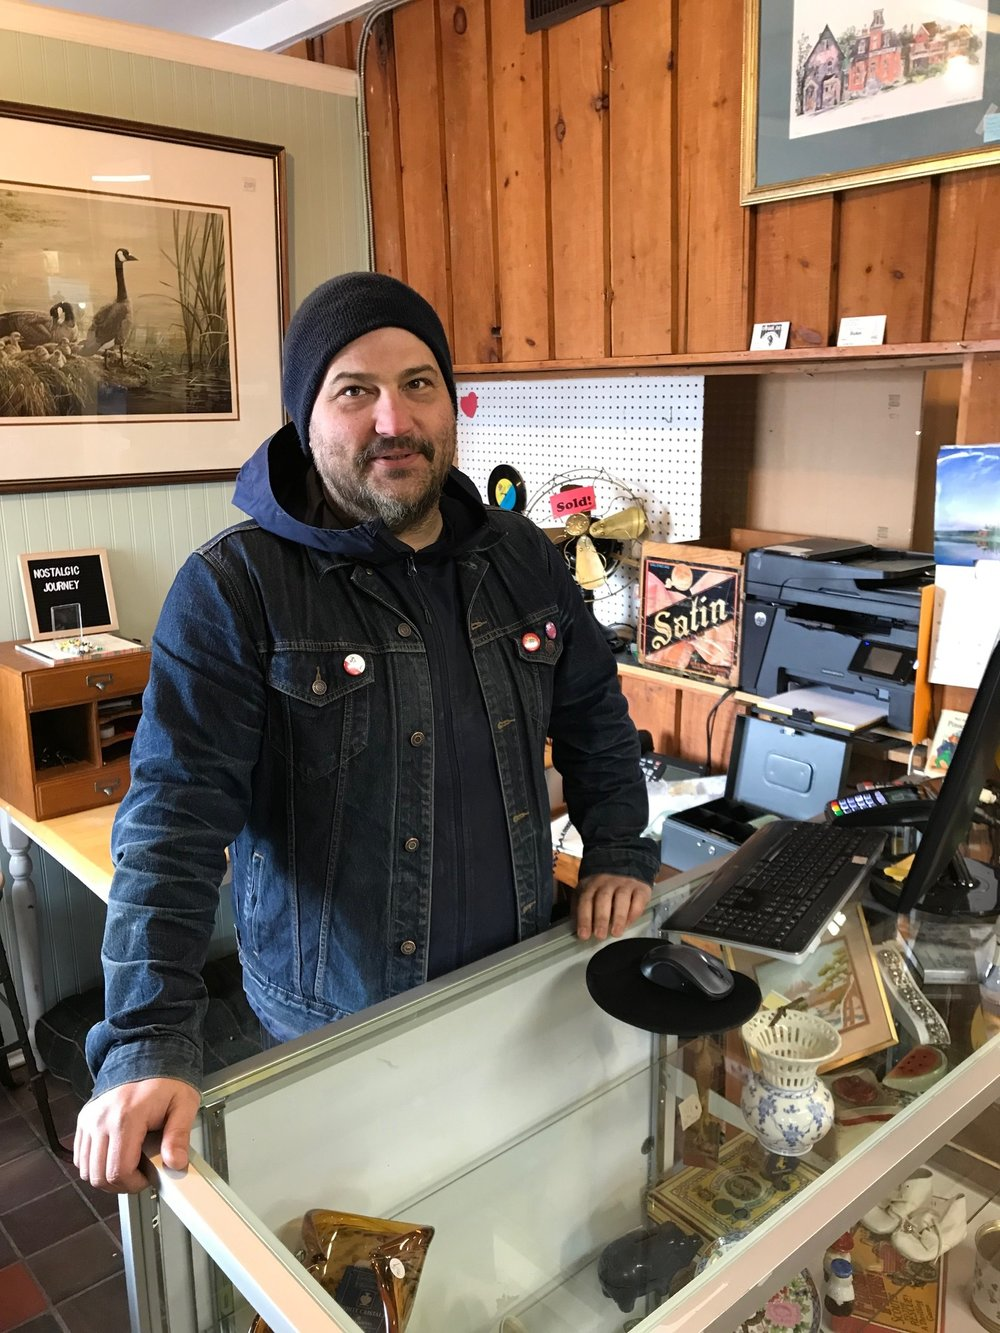 Jonathan Hall at Nostalgic Journey, Saturday, March 16th, 2019 (photo by Neil Morton)